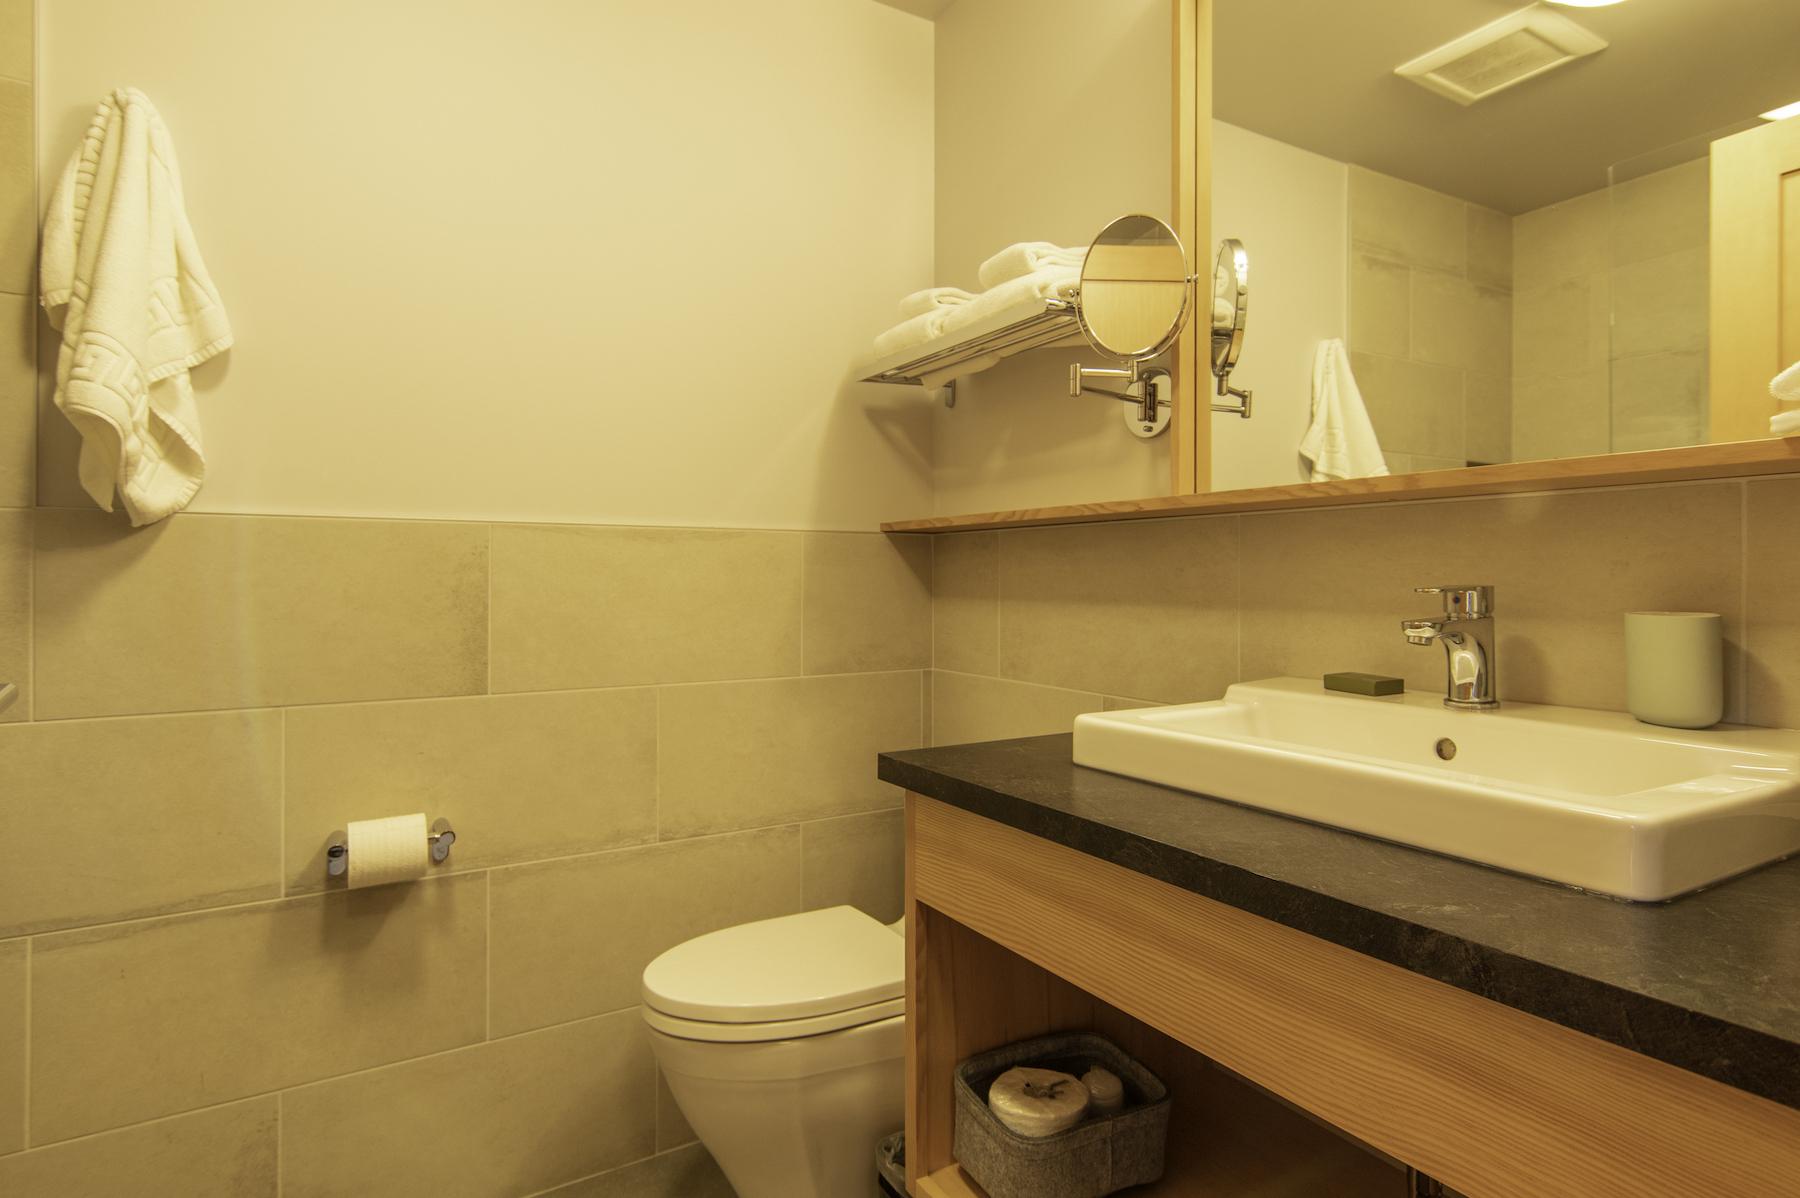 Bathroom of Deluxe Harbour View King + Patio